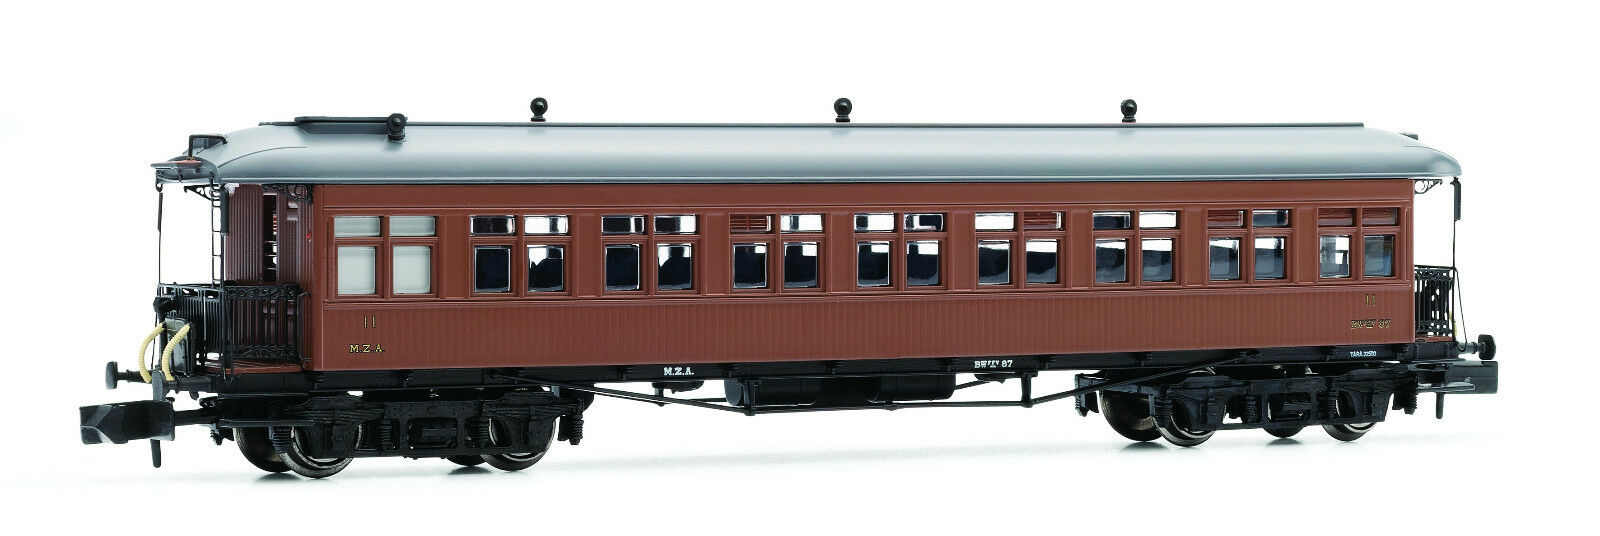 Arnold HN4232 Personenwagen Coche Costa 2 Kl. M.Z.A. BW 87 techo bajo